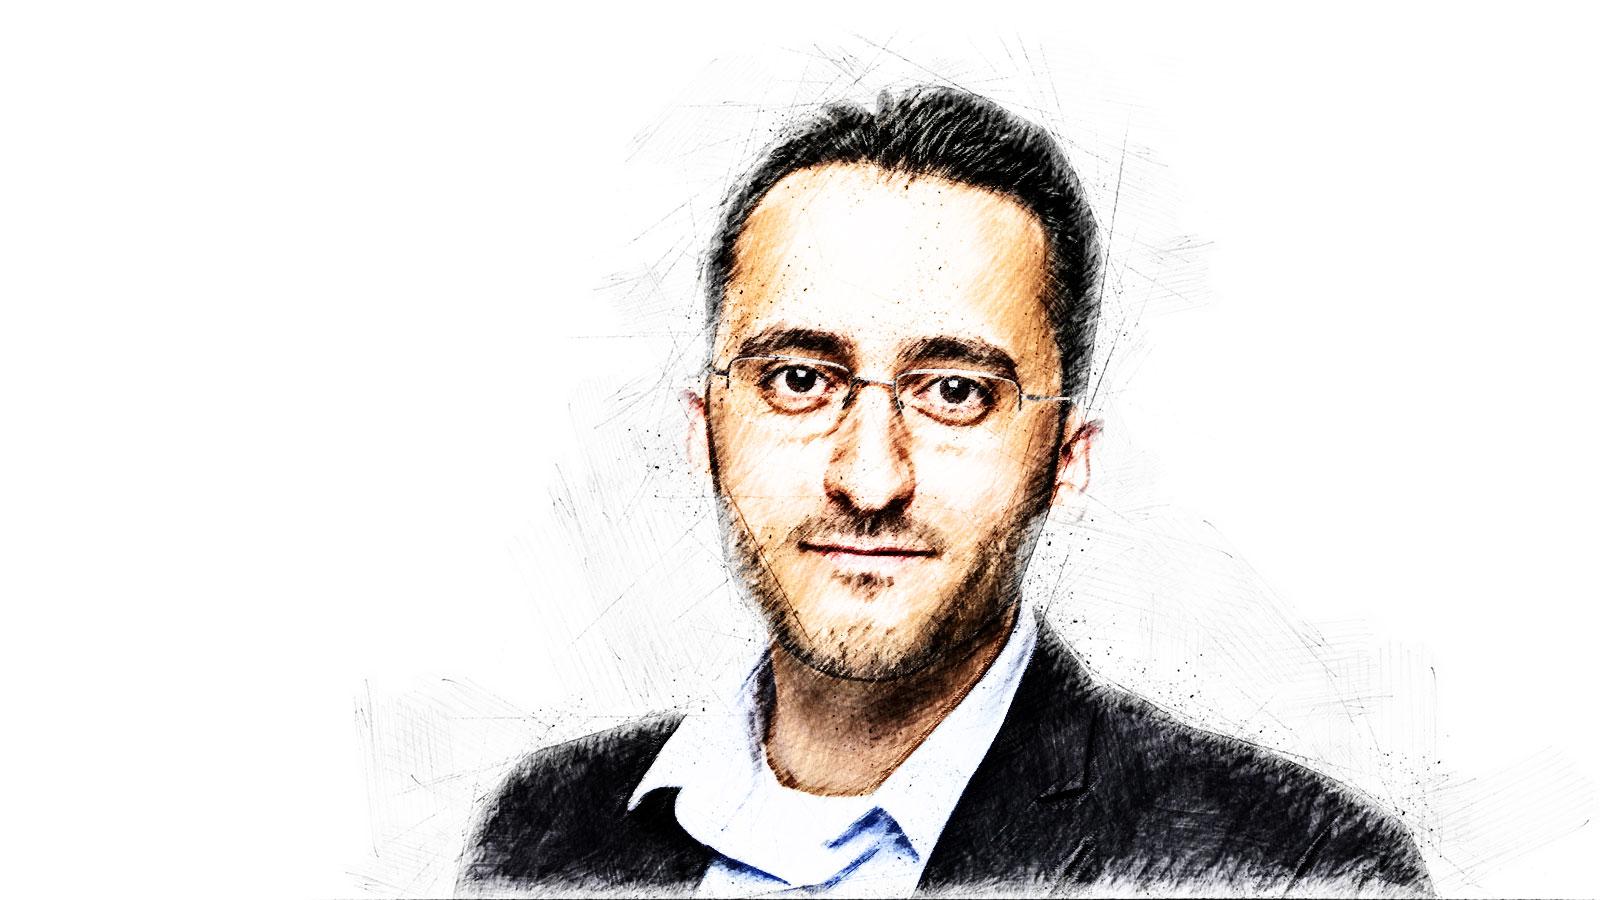 Said Rezek, MiGAZIN, Kommentar, Islam, Muslime, Integration